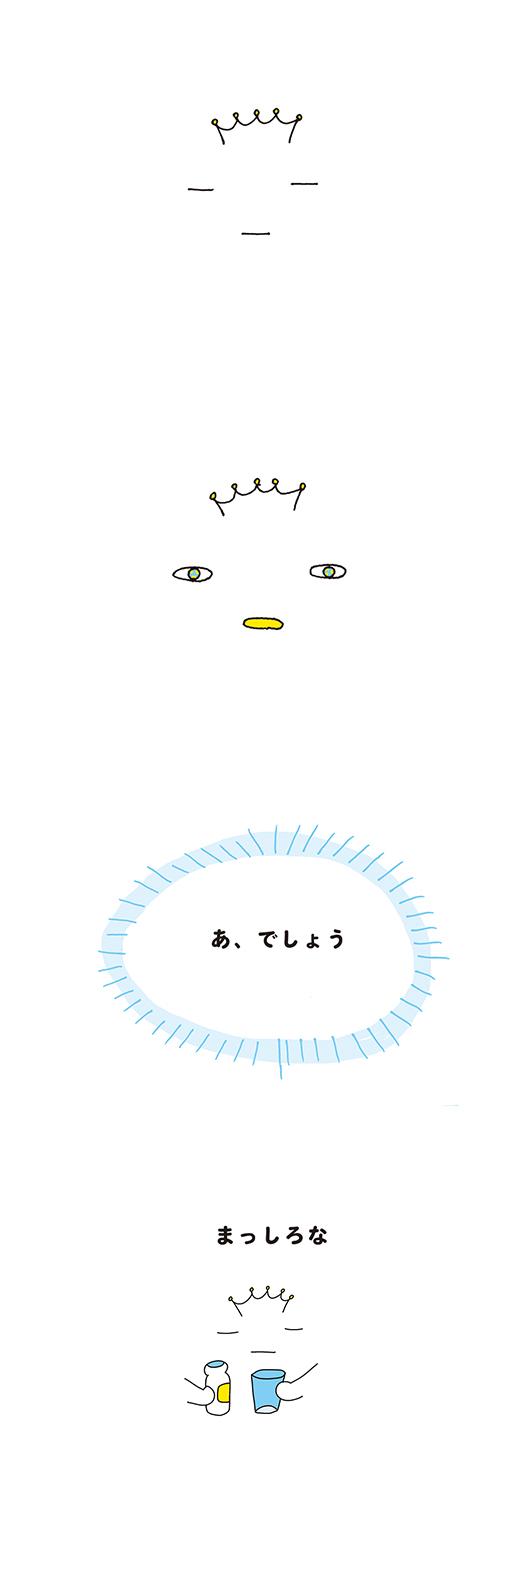 200624_kotaete_2_01